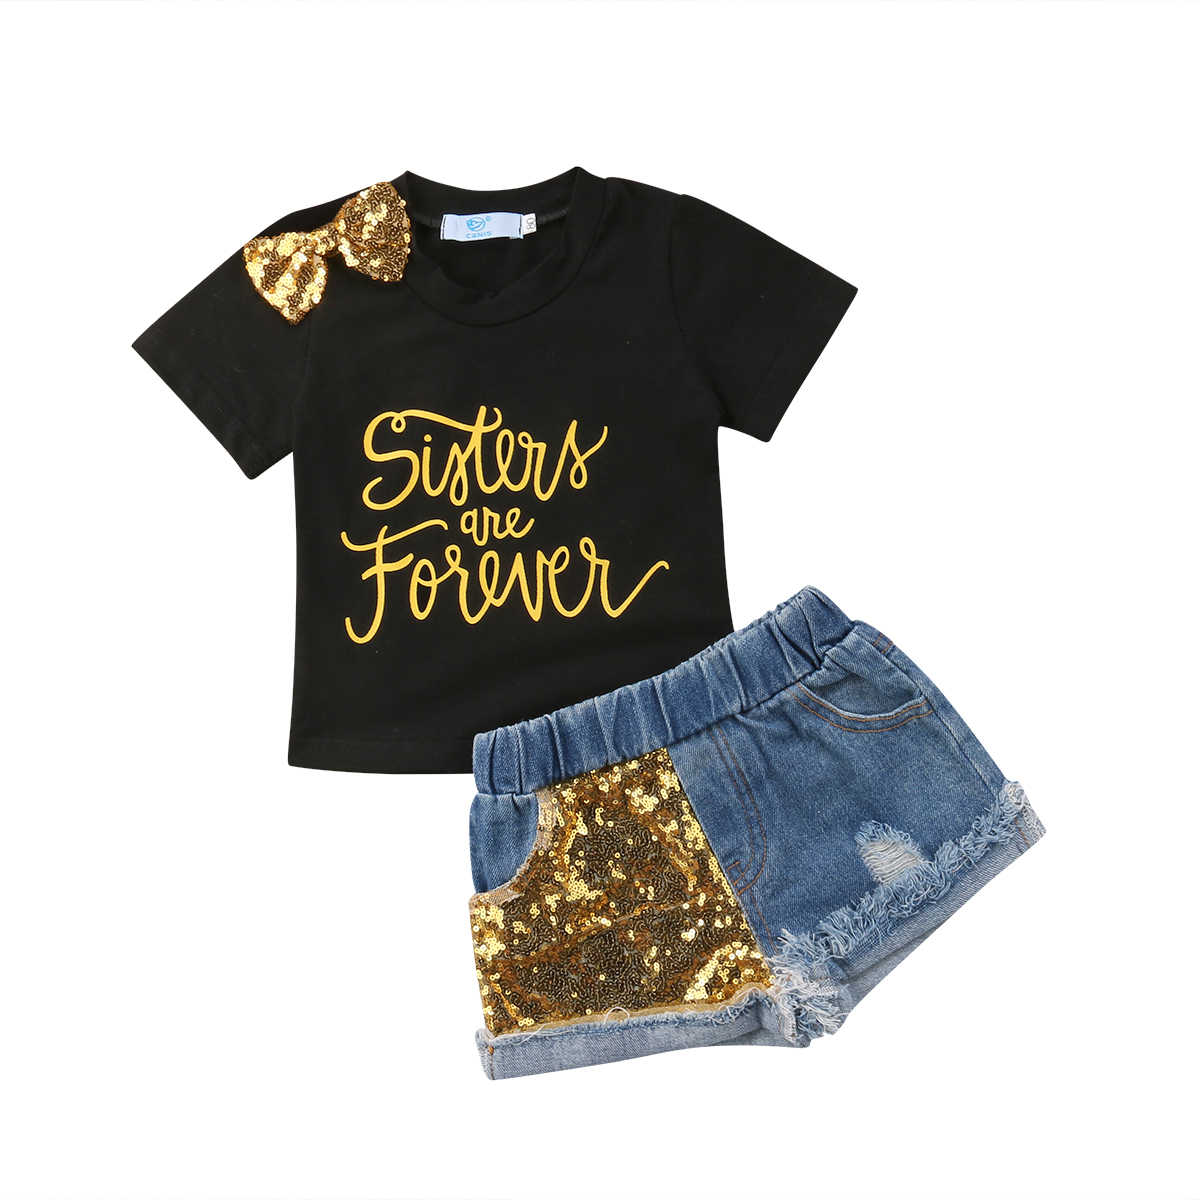 8b9fa466671f 2018 niños bebé niña Bowknot camisetas Top negro + lentejuelas oro ...